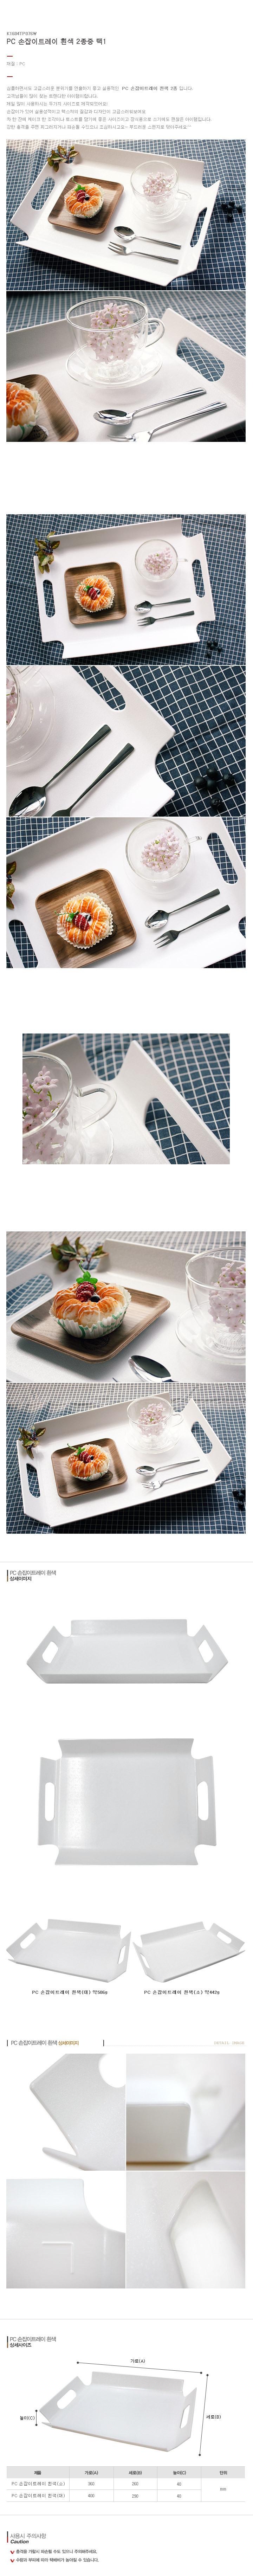 PC 손잡이트레이 흰색 갈색 블랙 6종중 택1 - 토다스, 5,700원, 주방소품, 쟁반/트레이